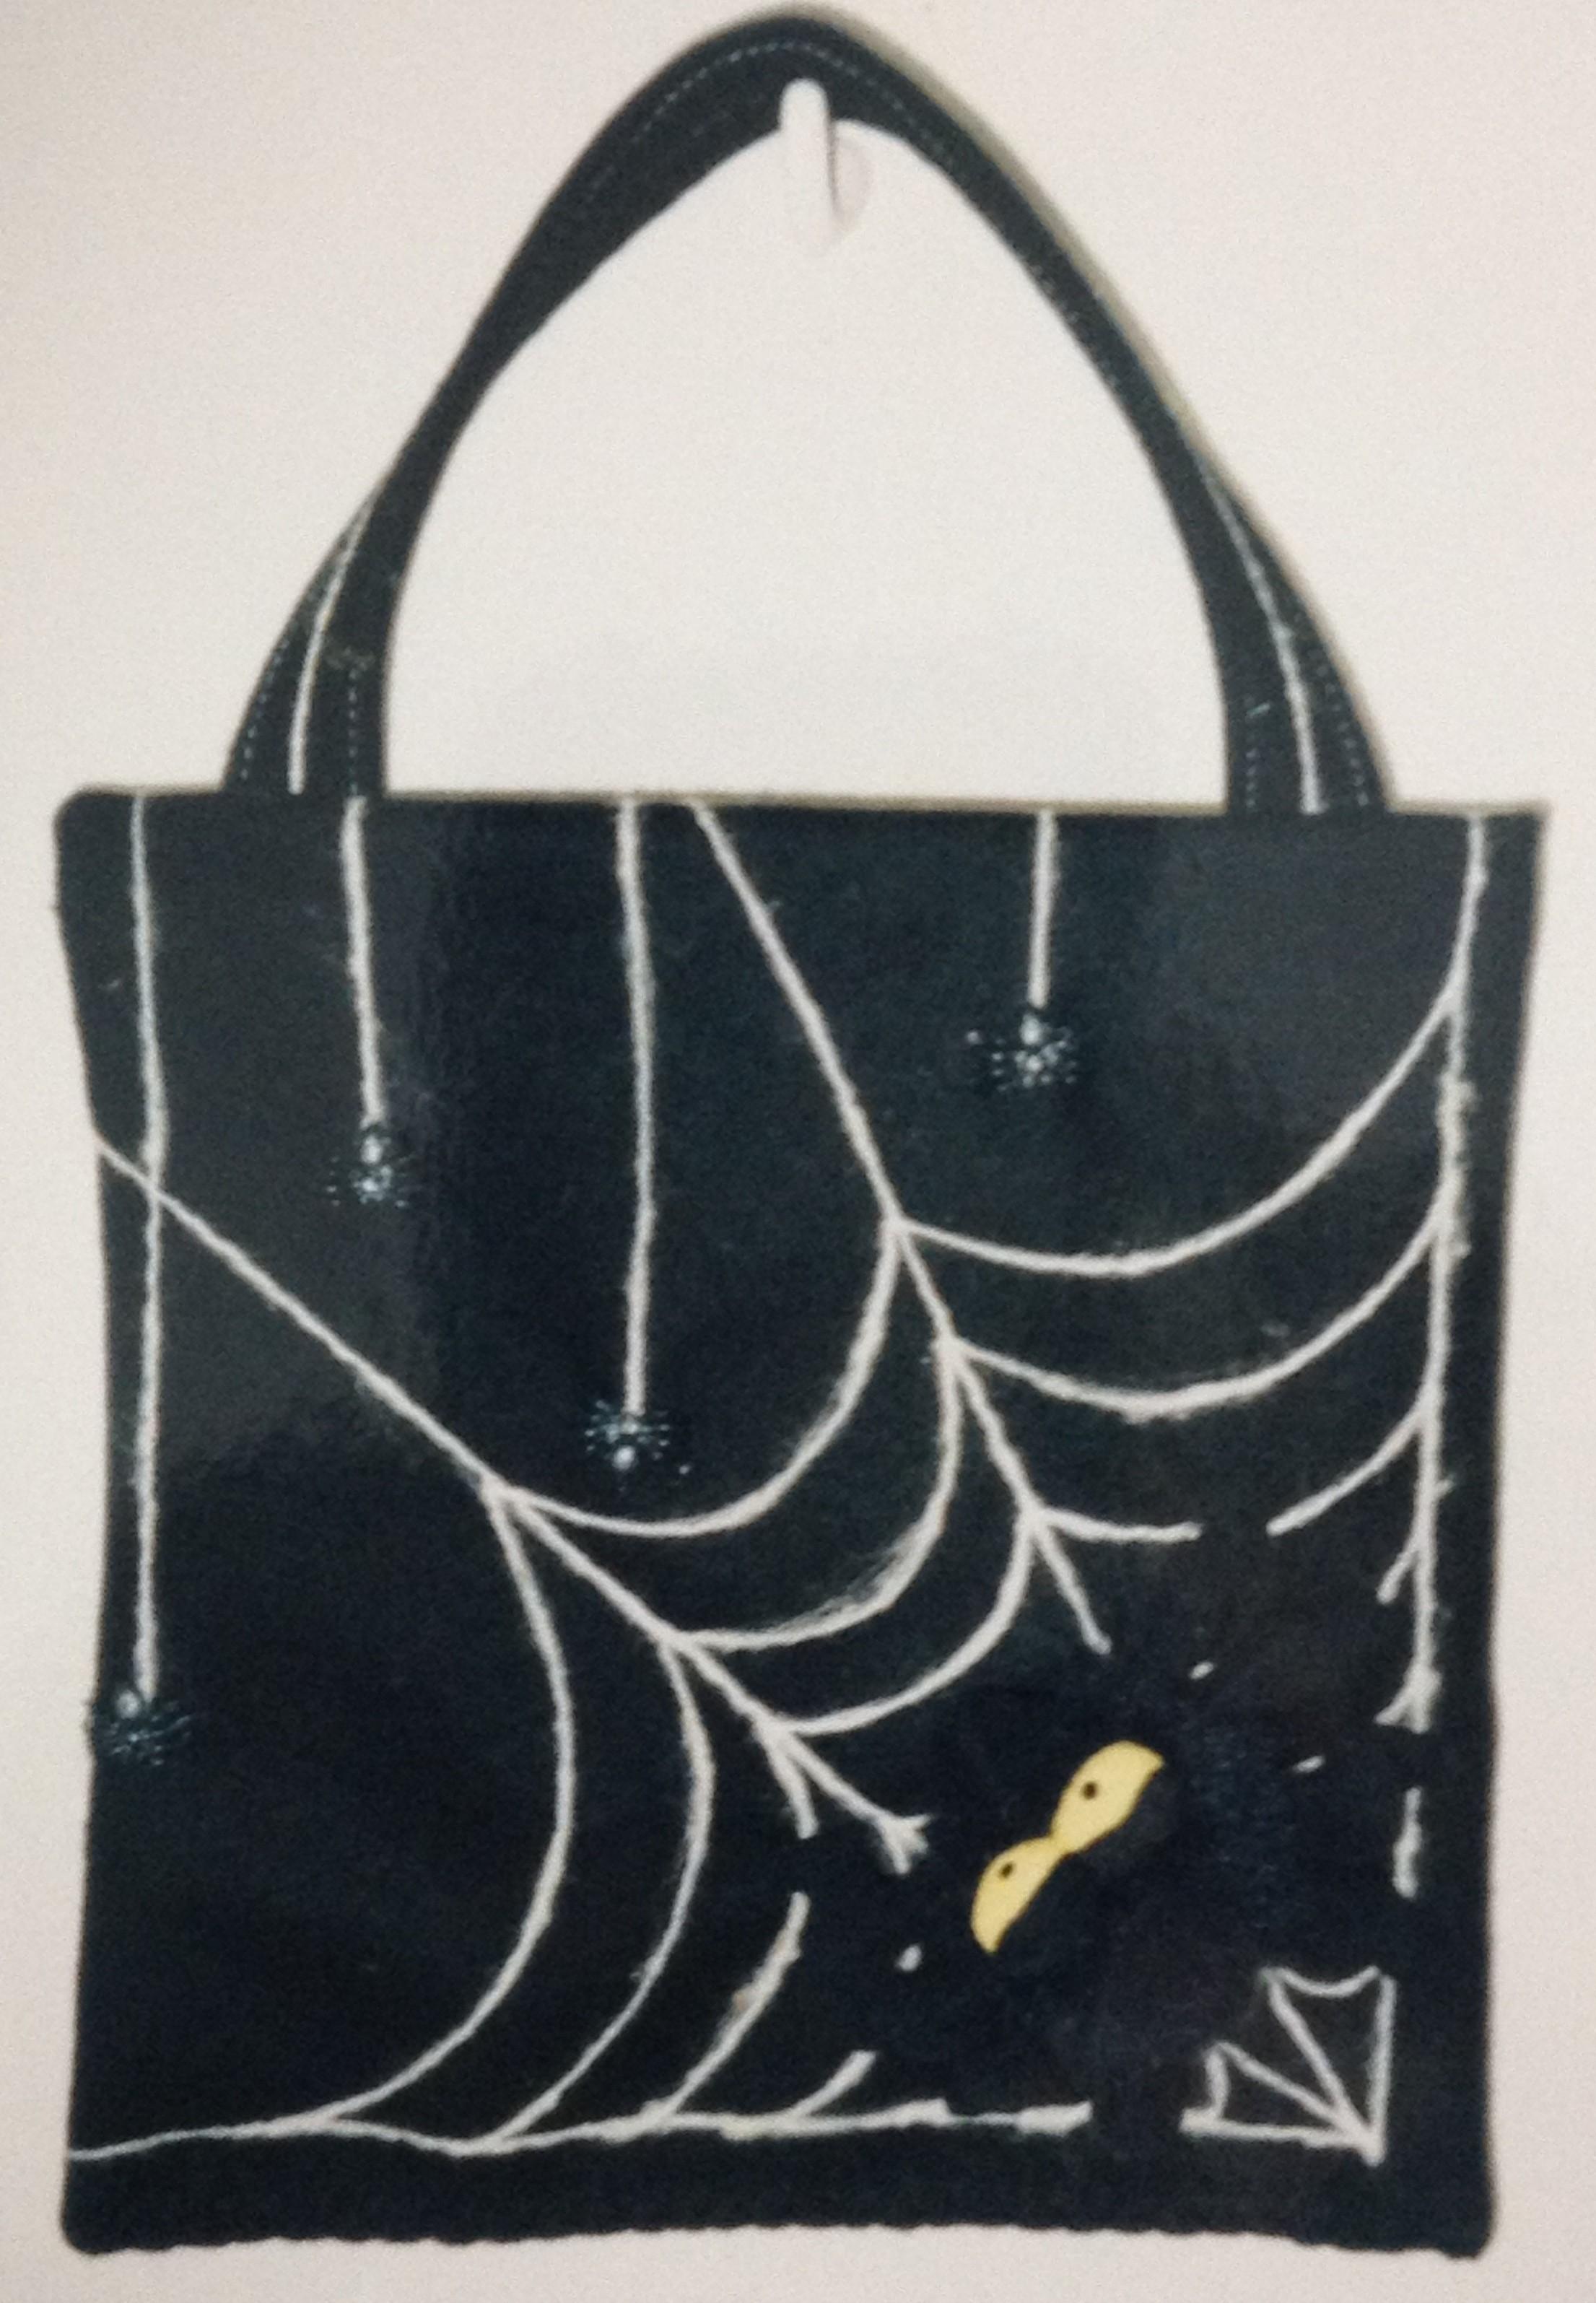 spiderweb-handbag